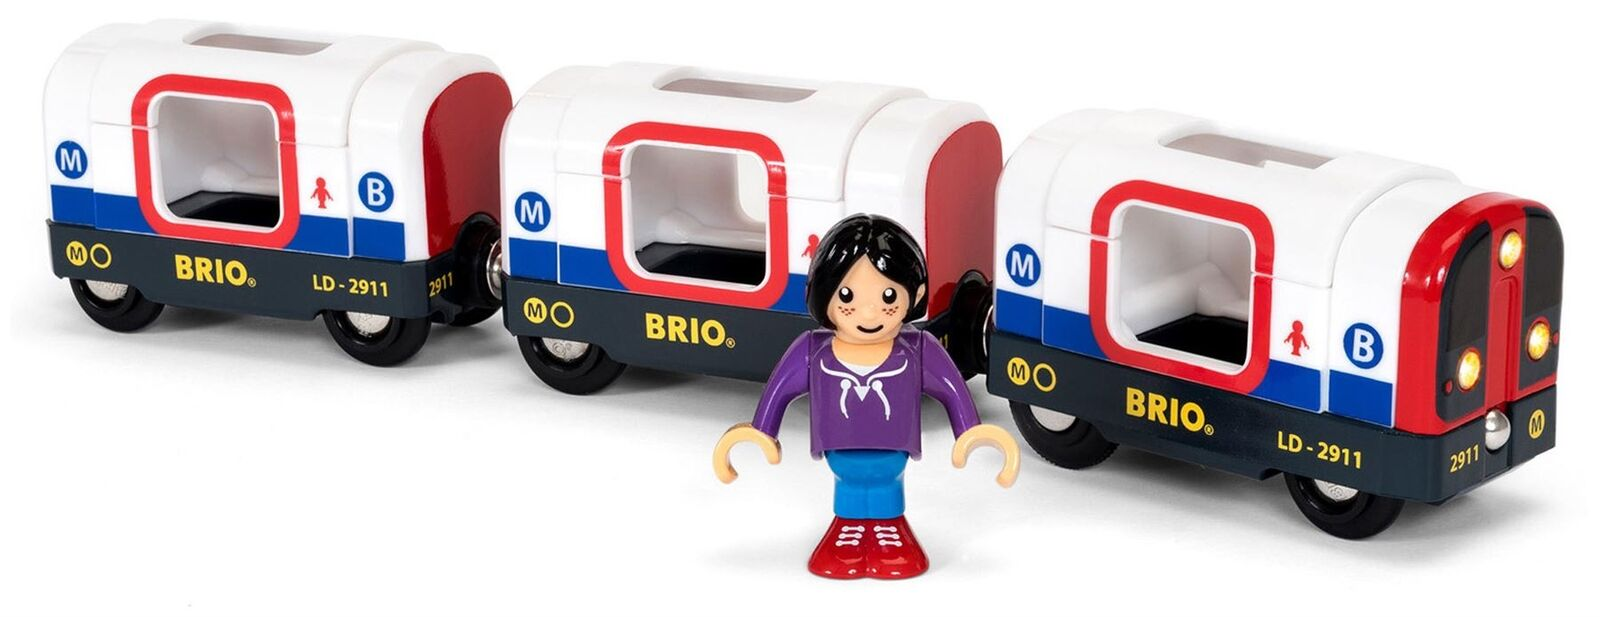 Brio TUBE METRO TRAIN Wooden Toy Train BN